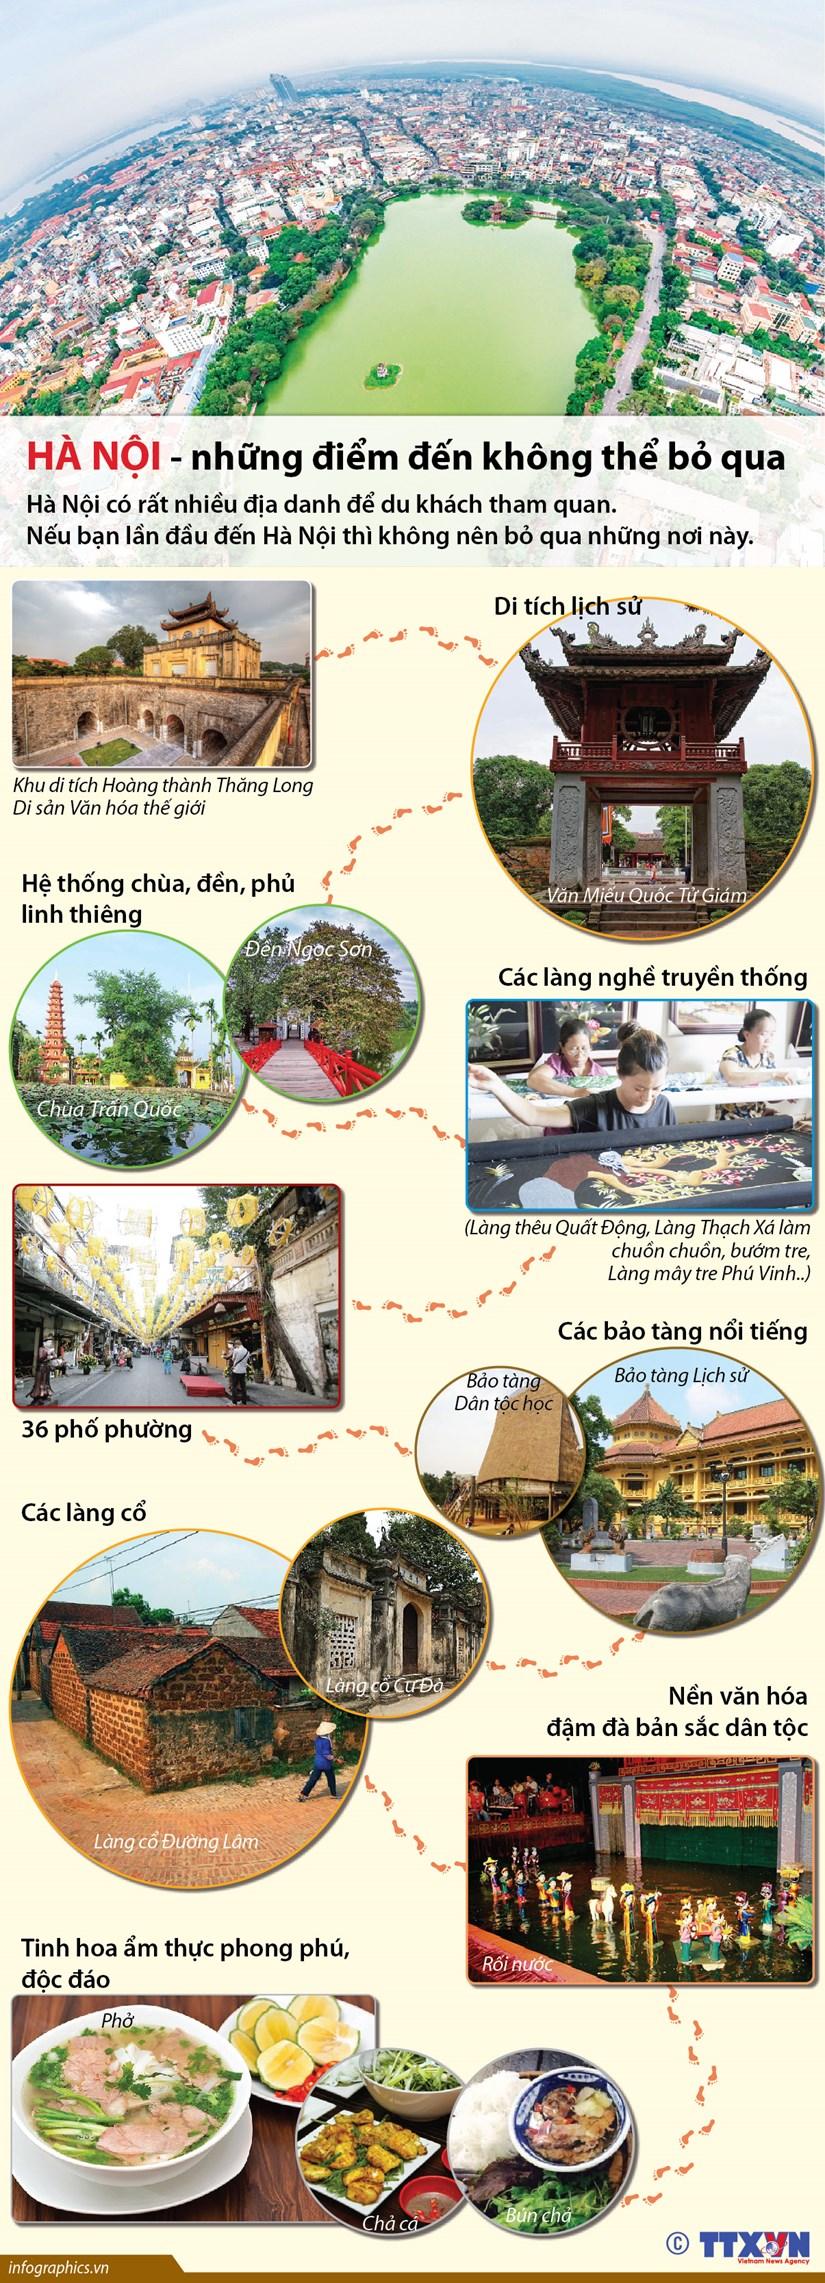 [Infographics] Ha Noi - nhung diem den khong the bo qua hinh anh 1